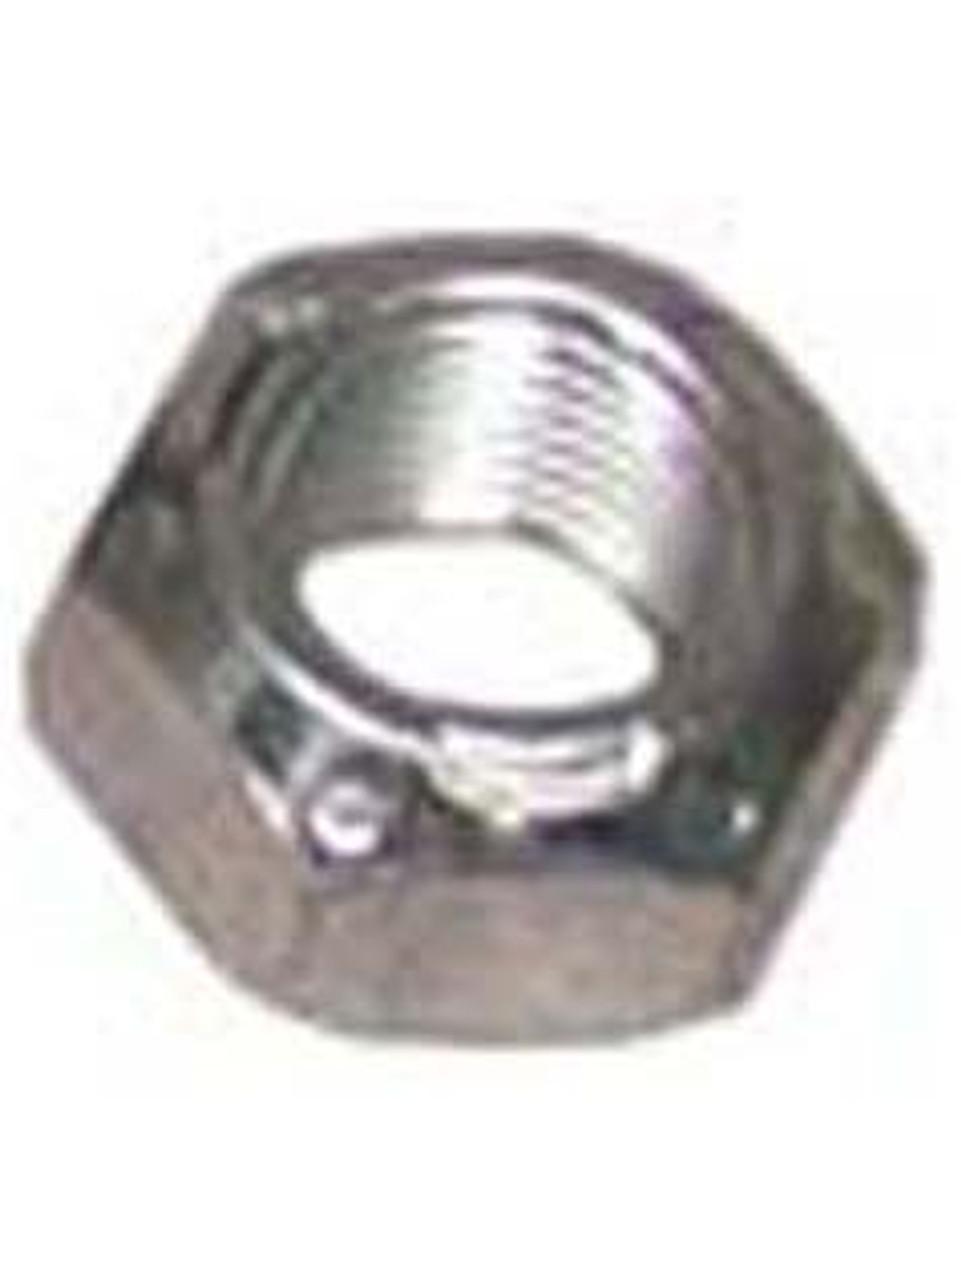 LN916G8ZF --- Lock Nut